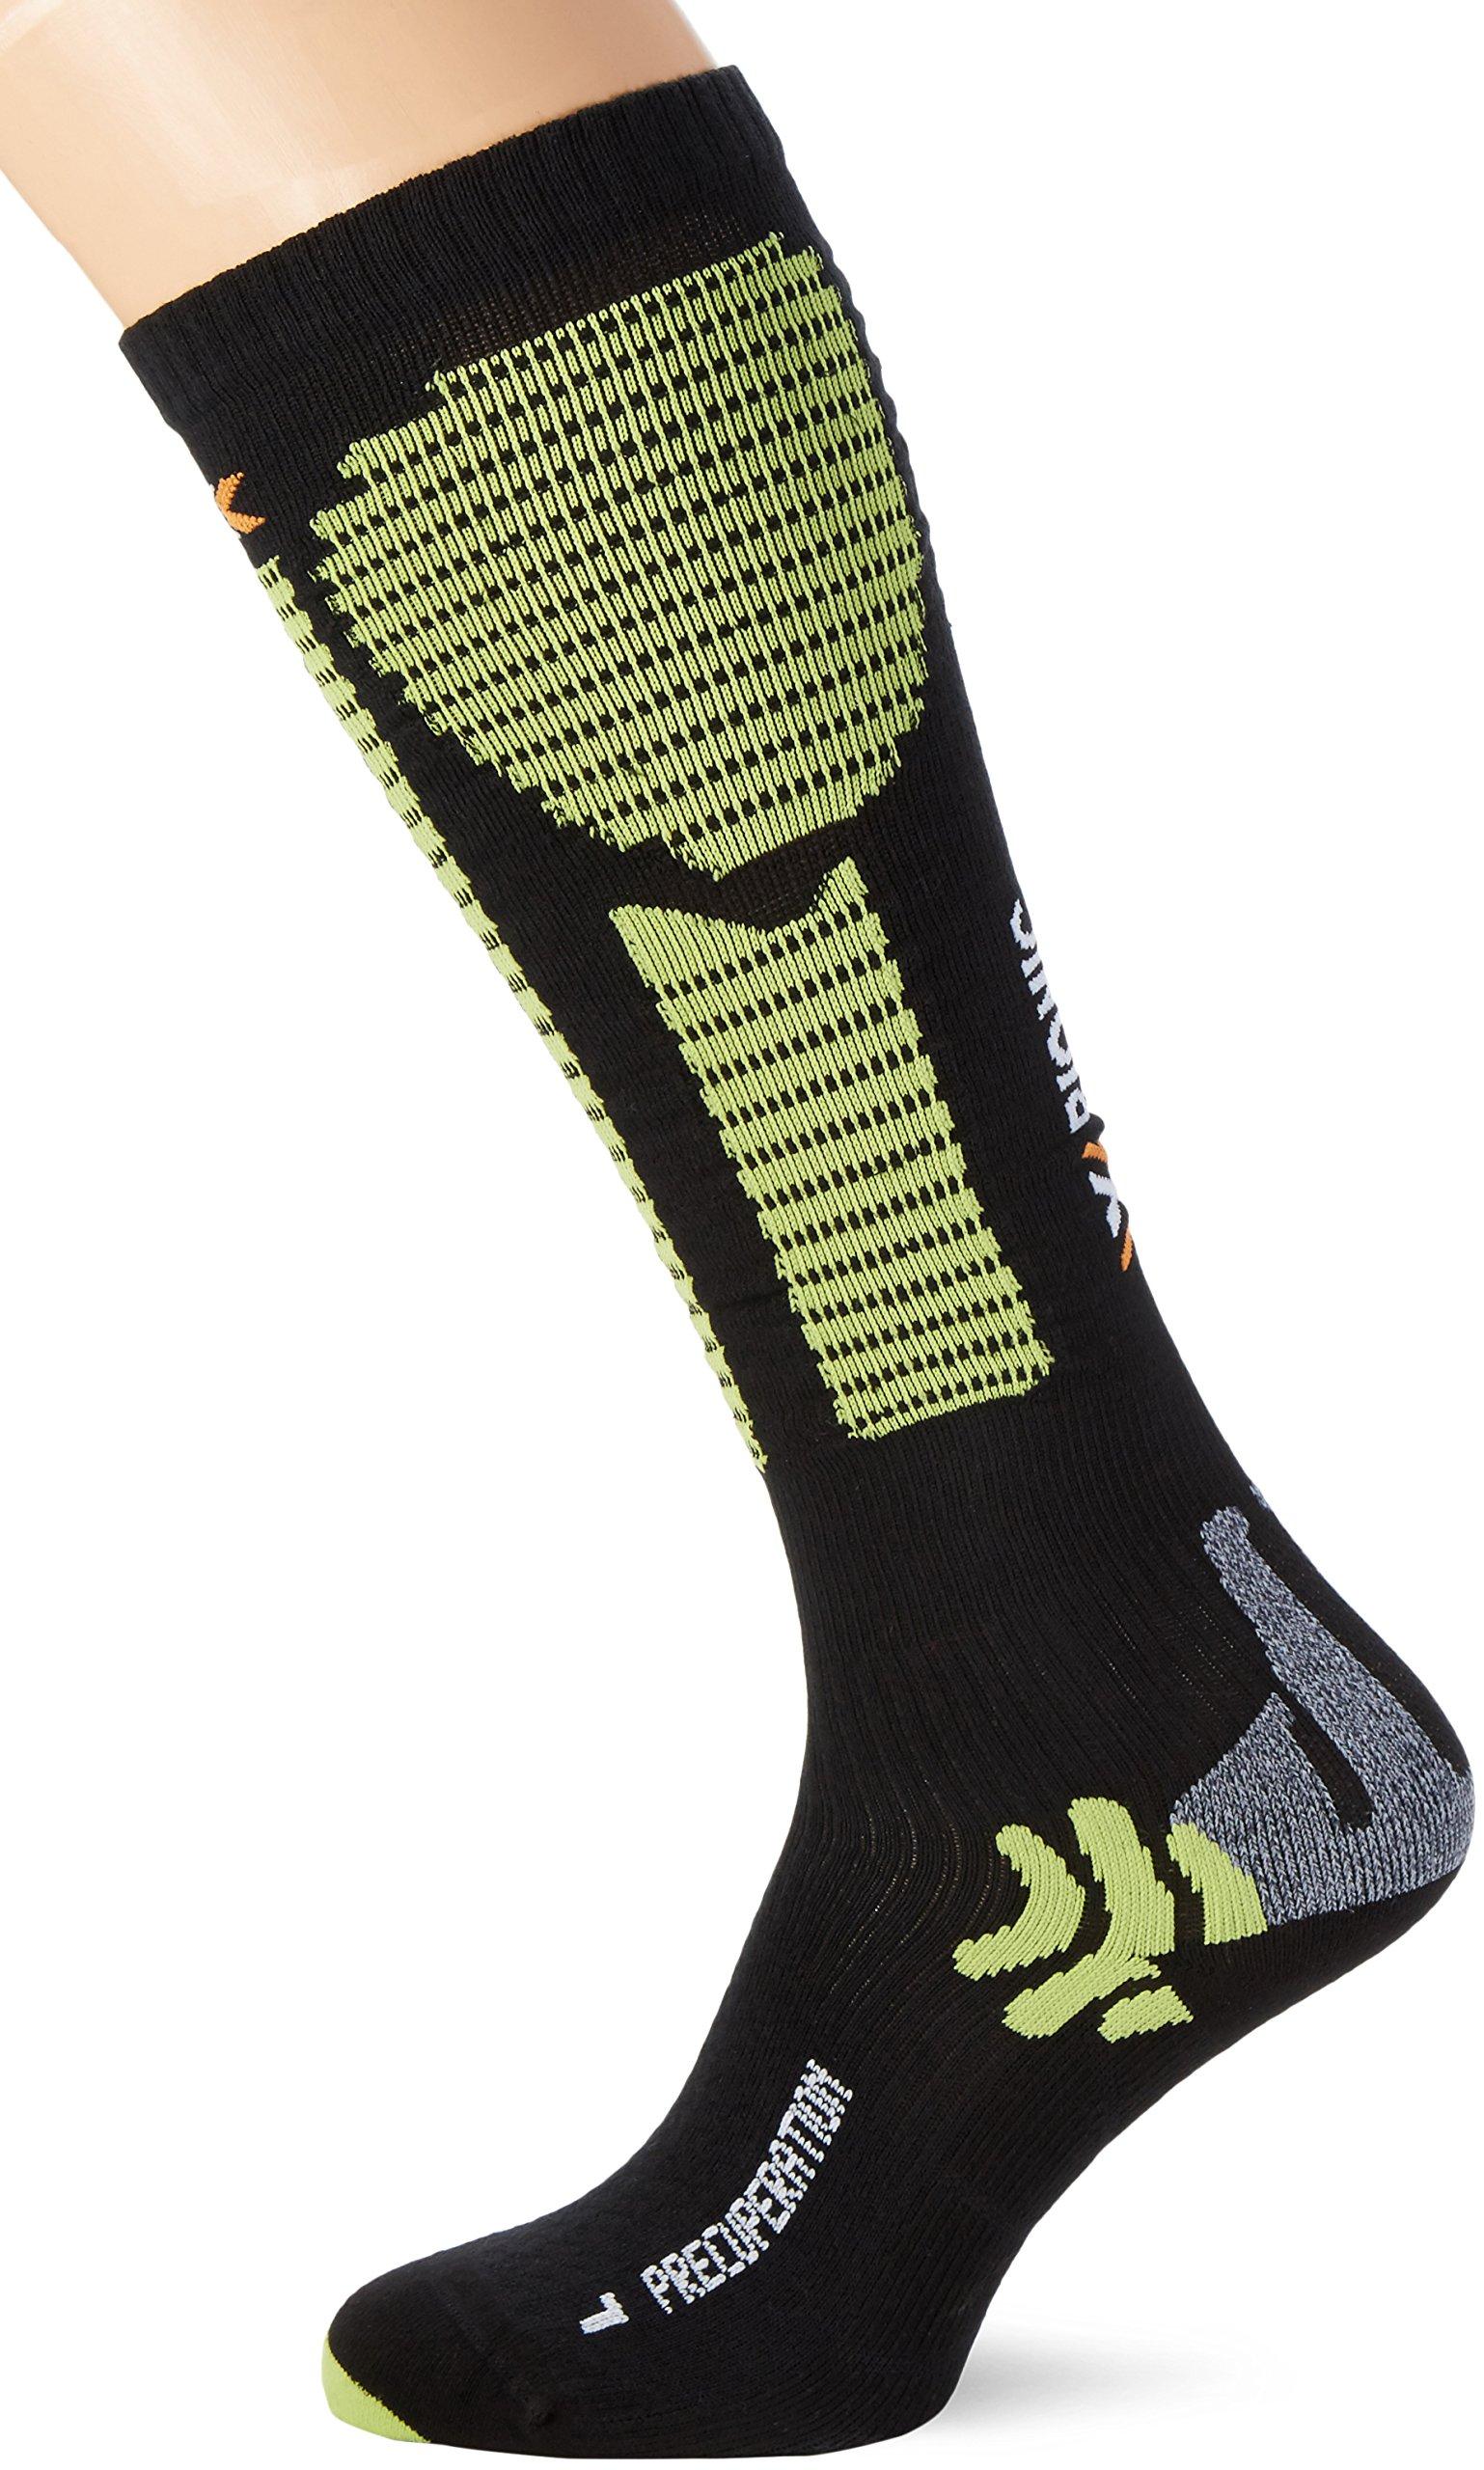 X-Socks precuperation respirantes Multicolore Black/Acid Green 43/46 M